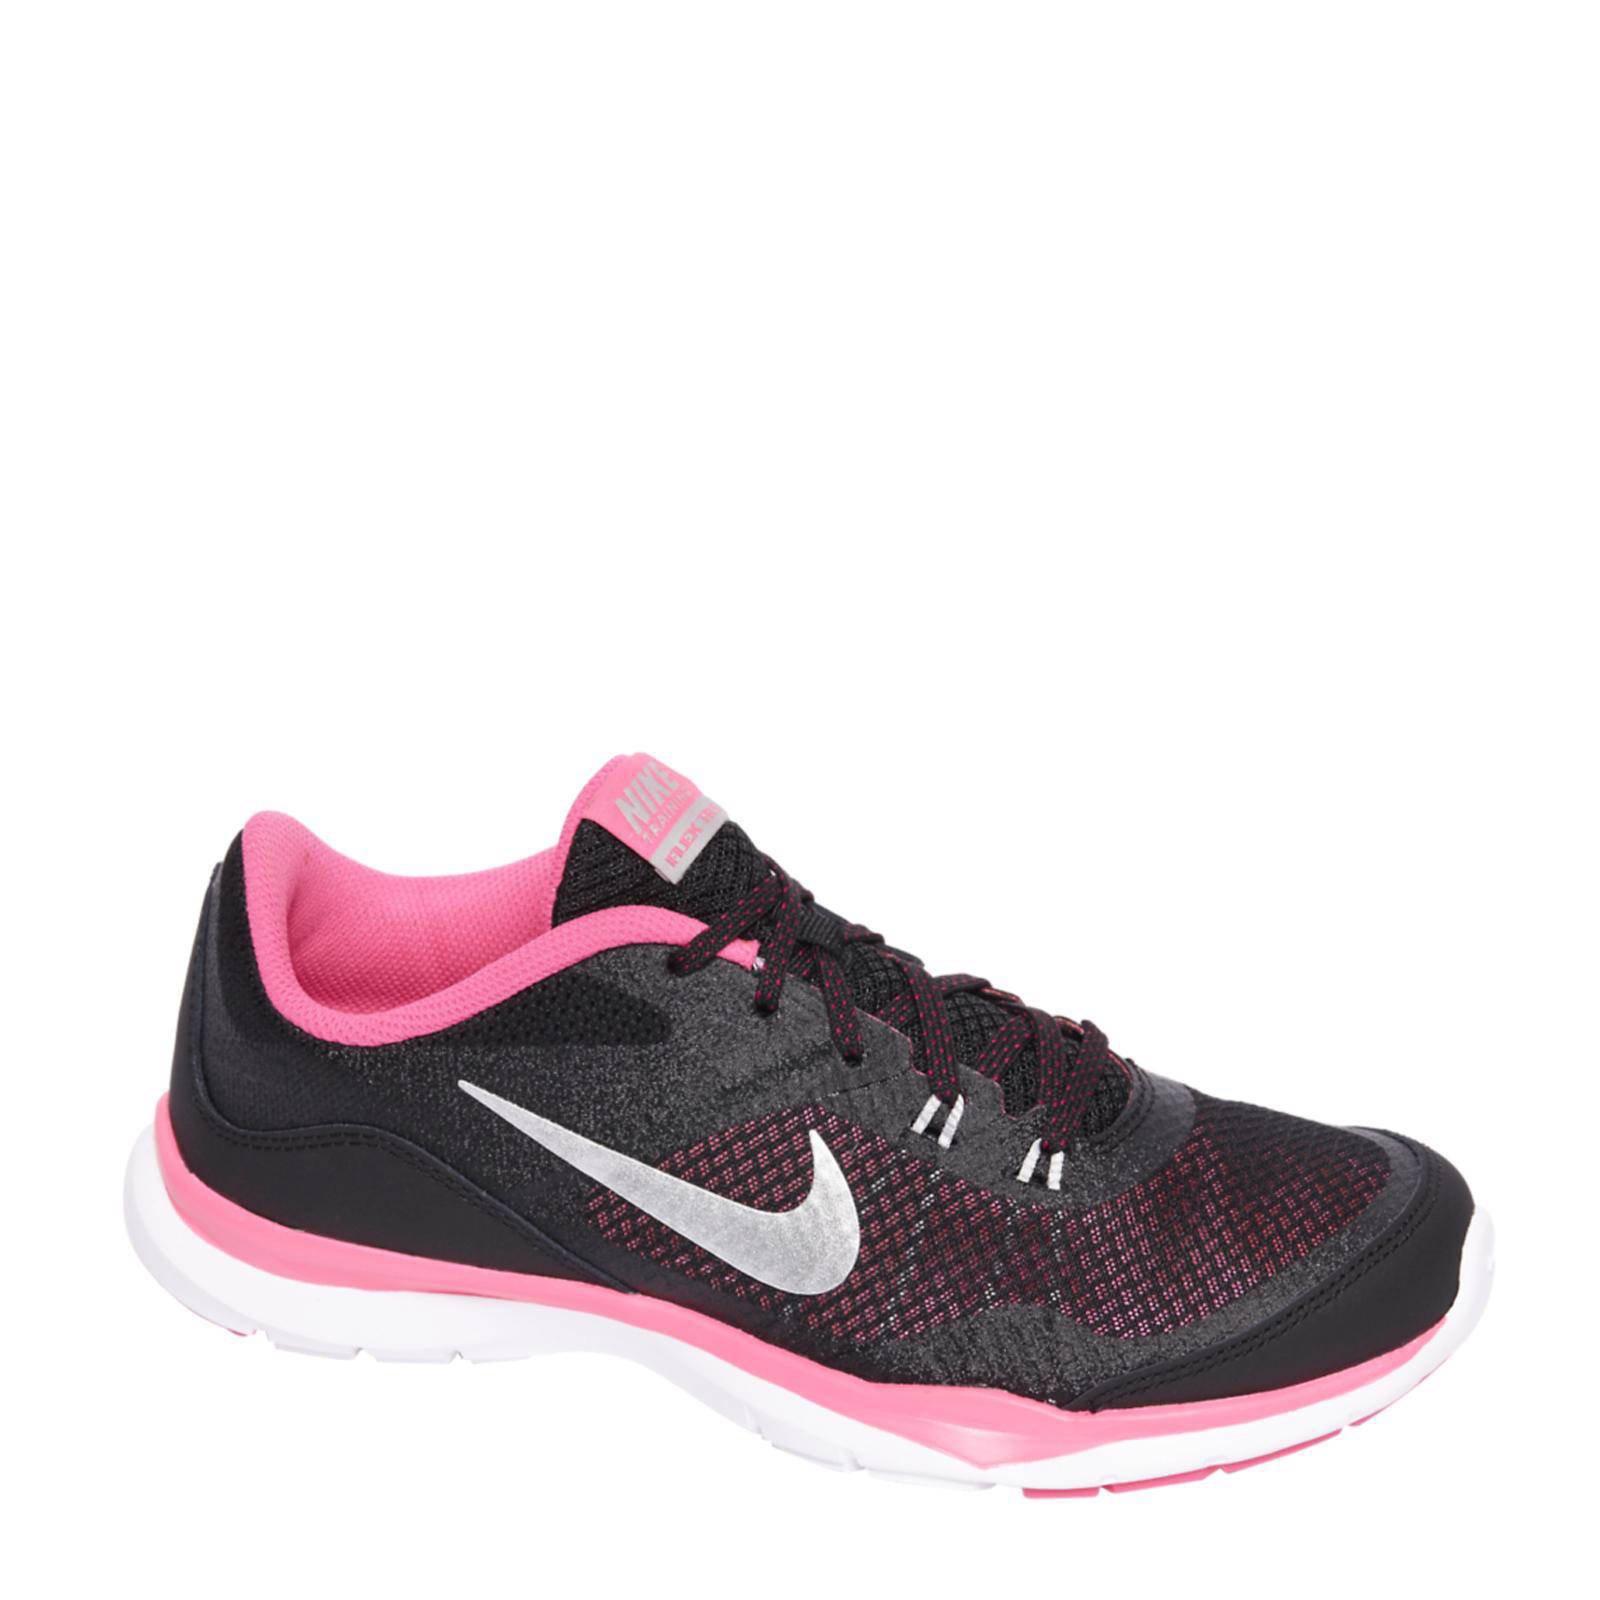 5d8f54753b7 Nike lichtgewicht sneakers | wehkamp